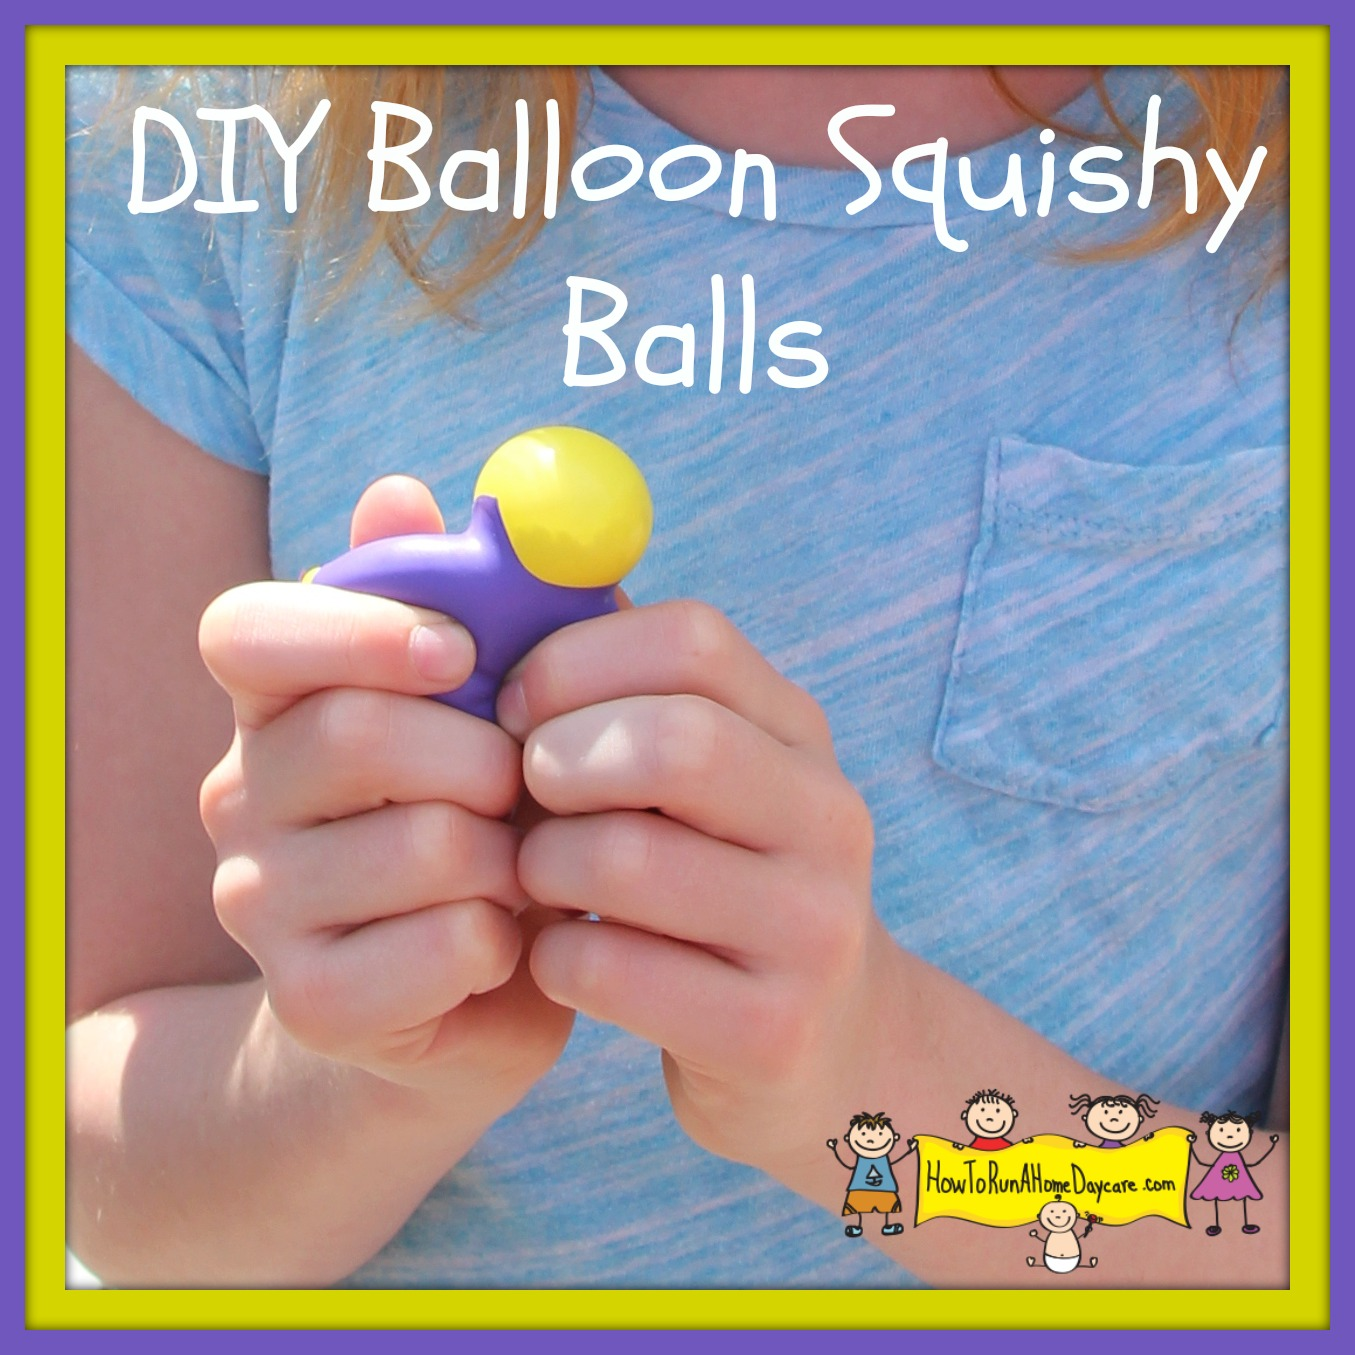 Squishy Ball Diy : DIY Balloon Squishy Ball - How To Run A Home Daycare